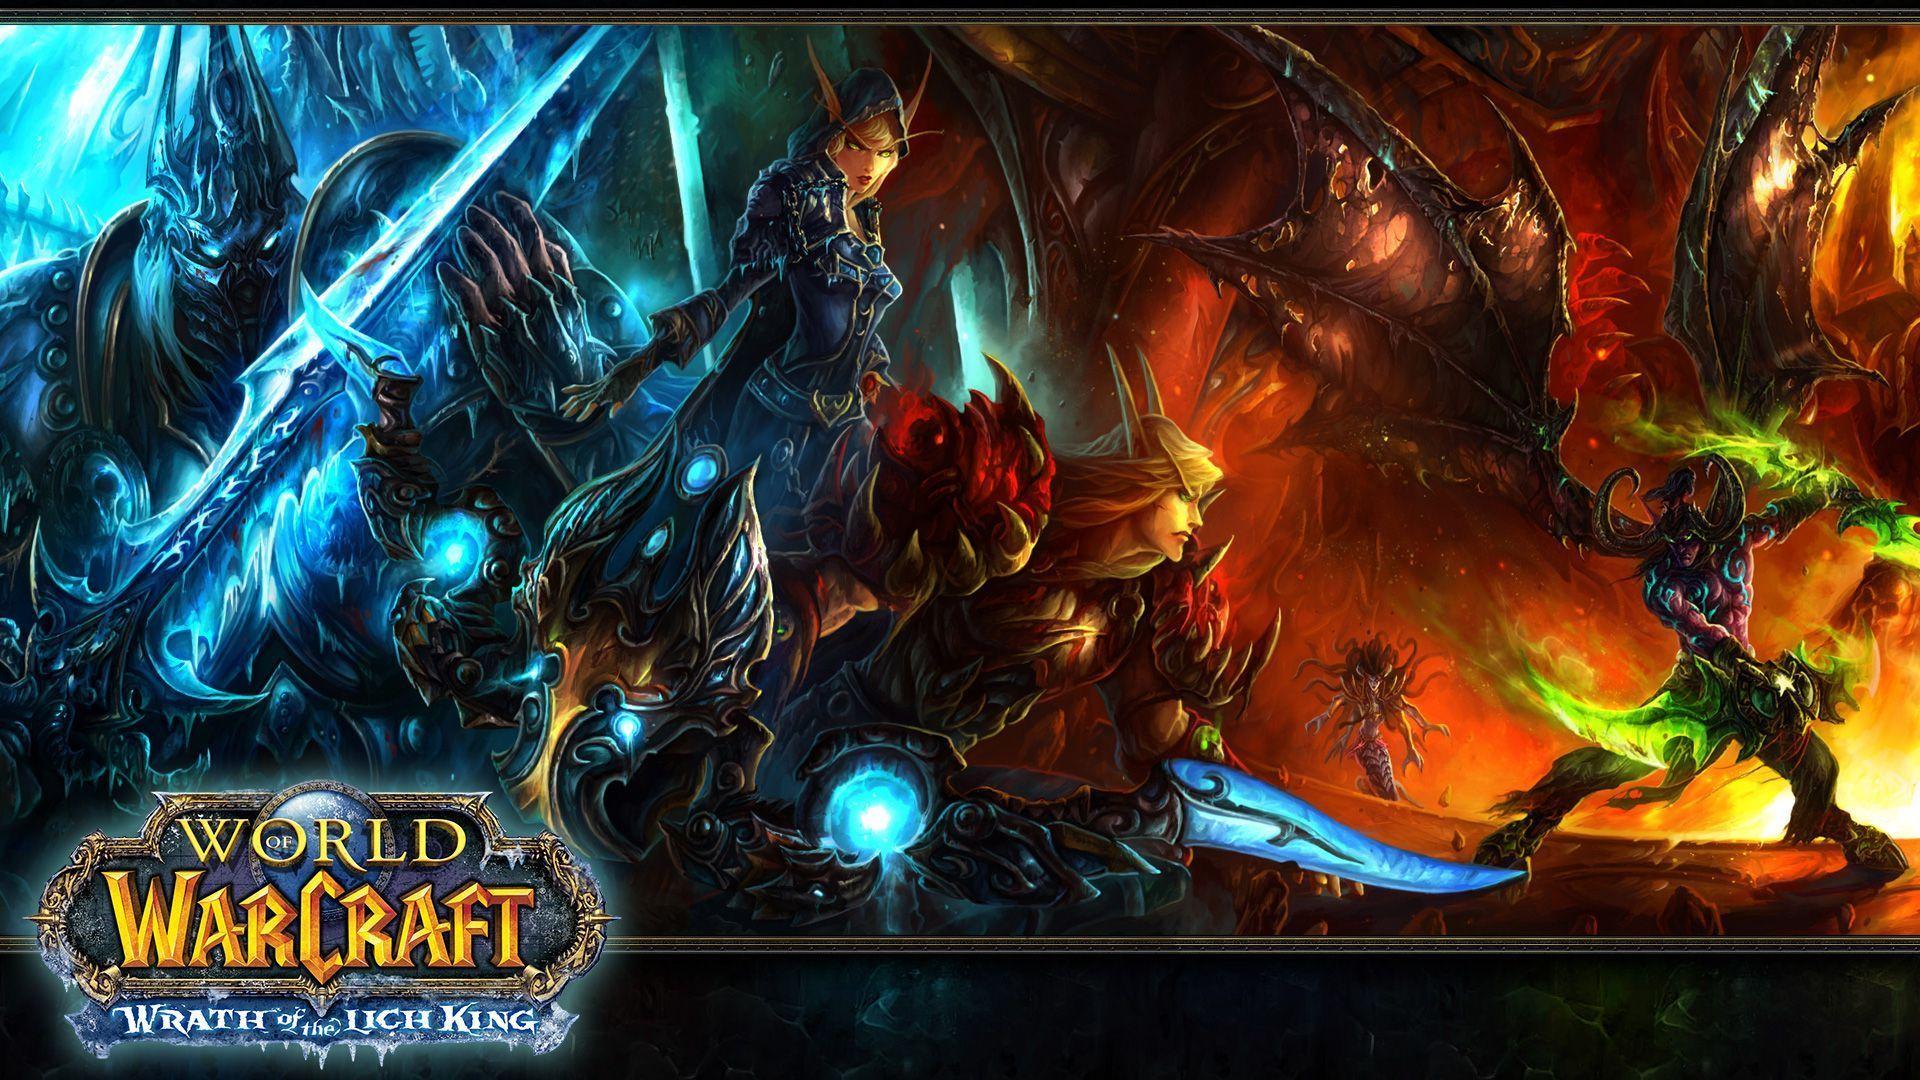 Korea Alliance Wallpaper 1024 640 World Of Warcraft Alliance Wallpaper 40 World Of Warcraft Wallpaper World Of Warcraft Game World Of Warcraft Burning Crusade